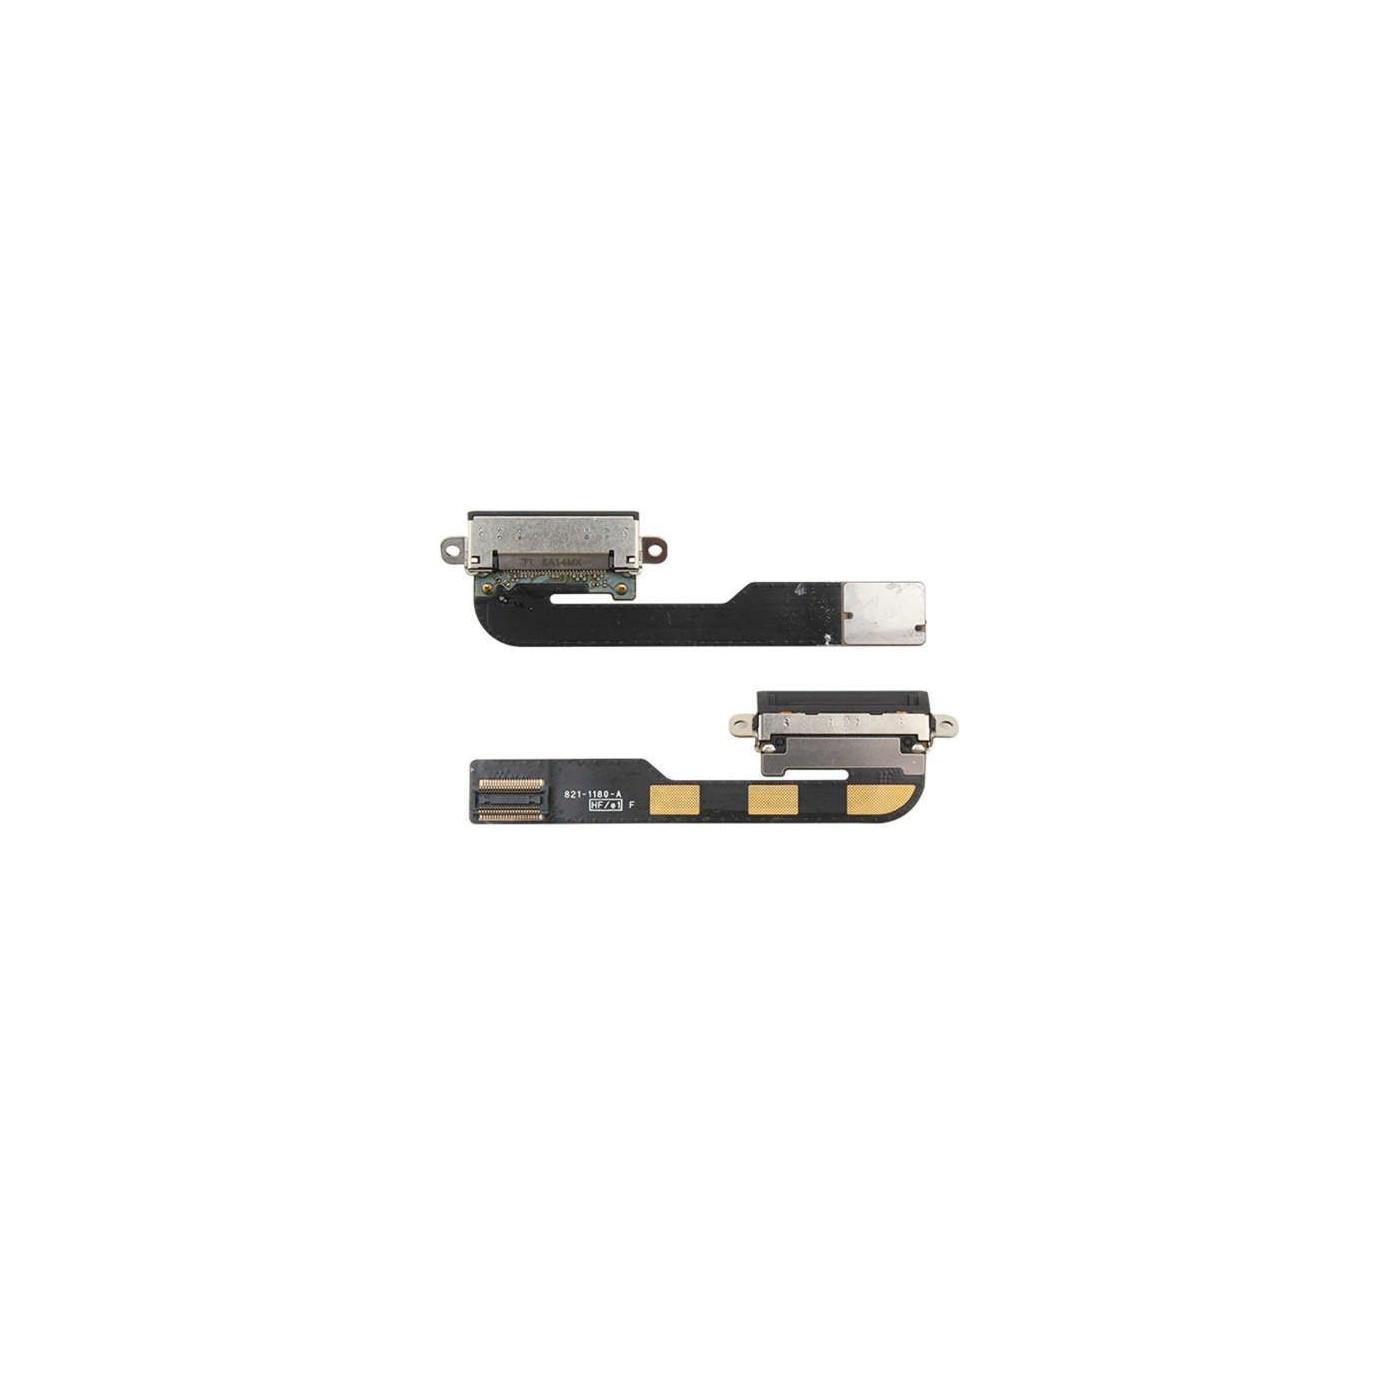 Ladeanschluss für Apple iPad 2 Flex-Flachladeanschluss